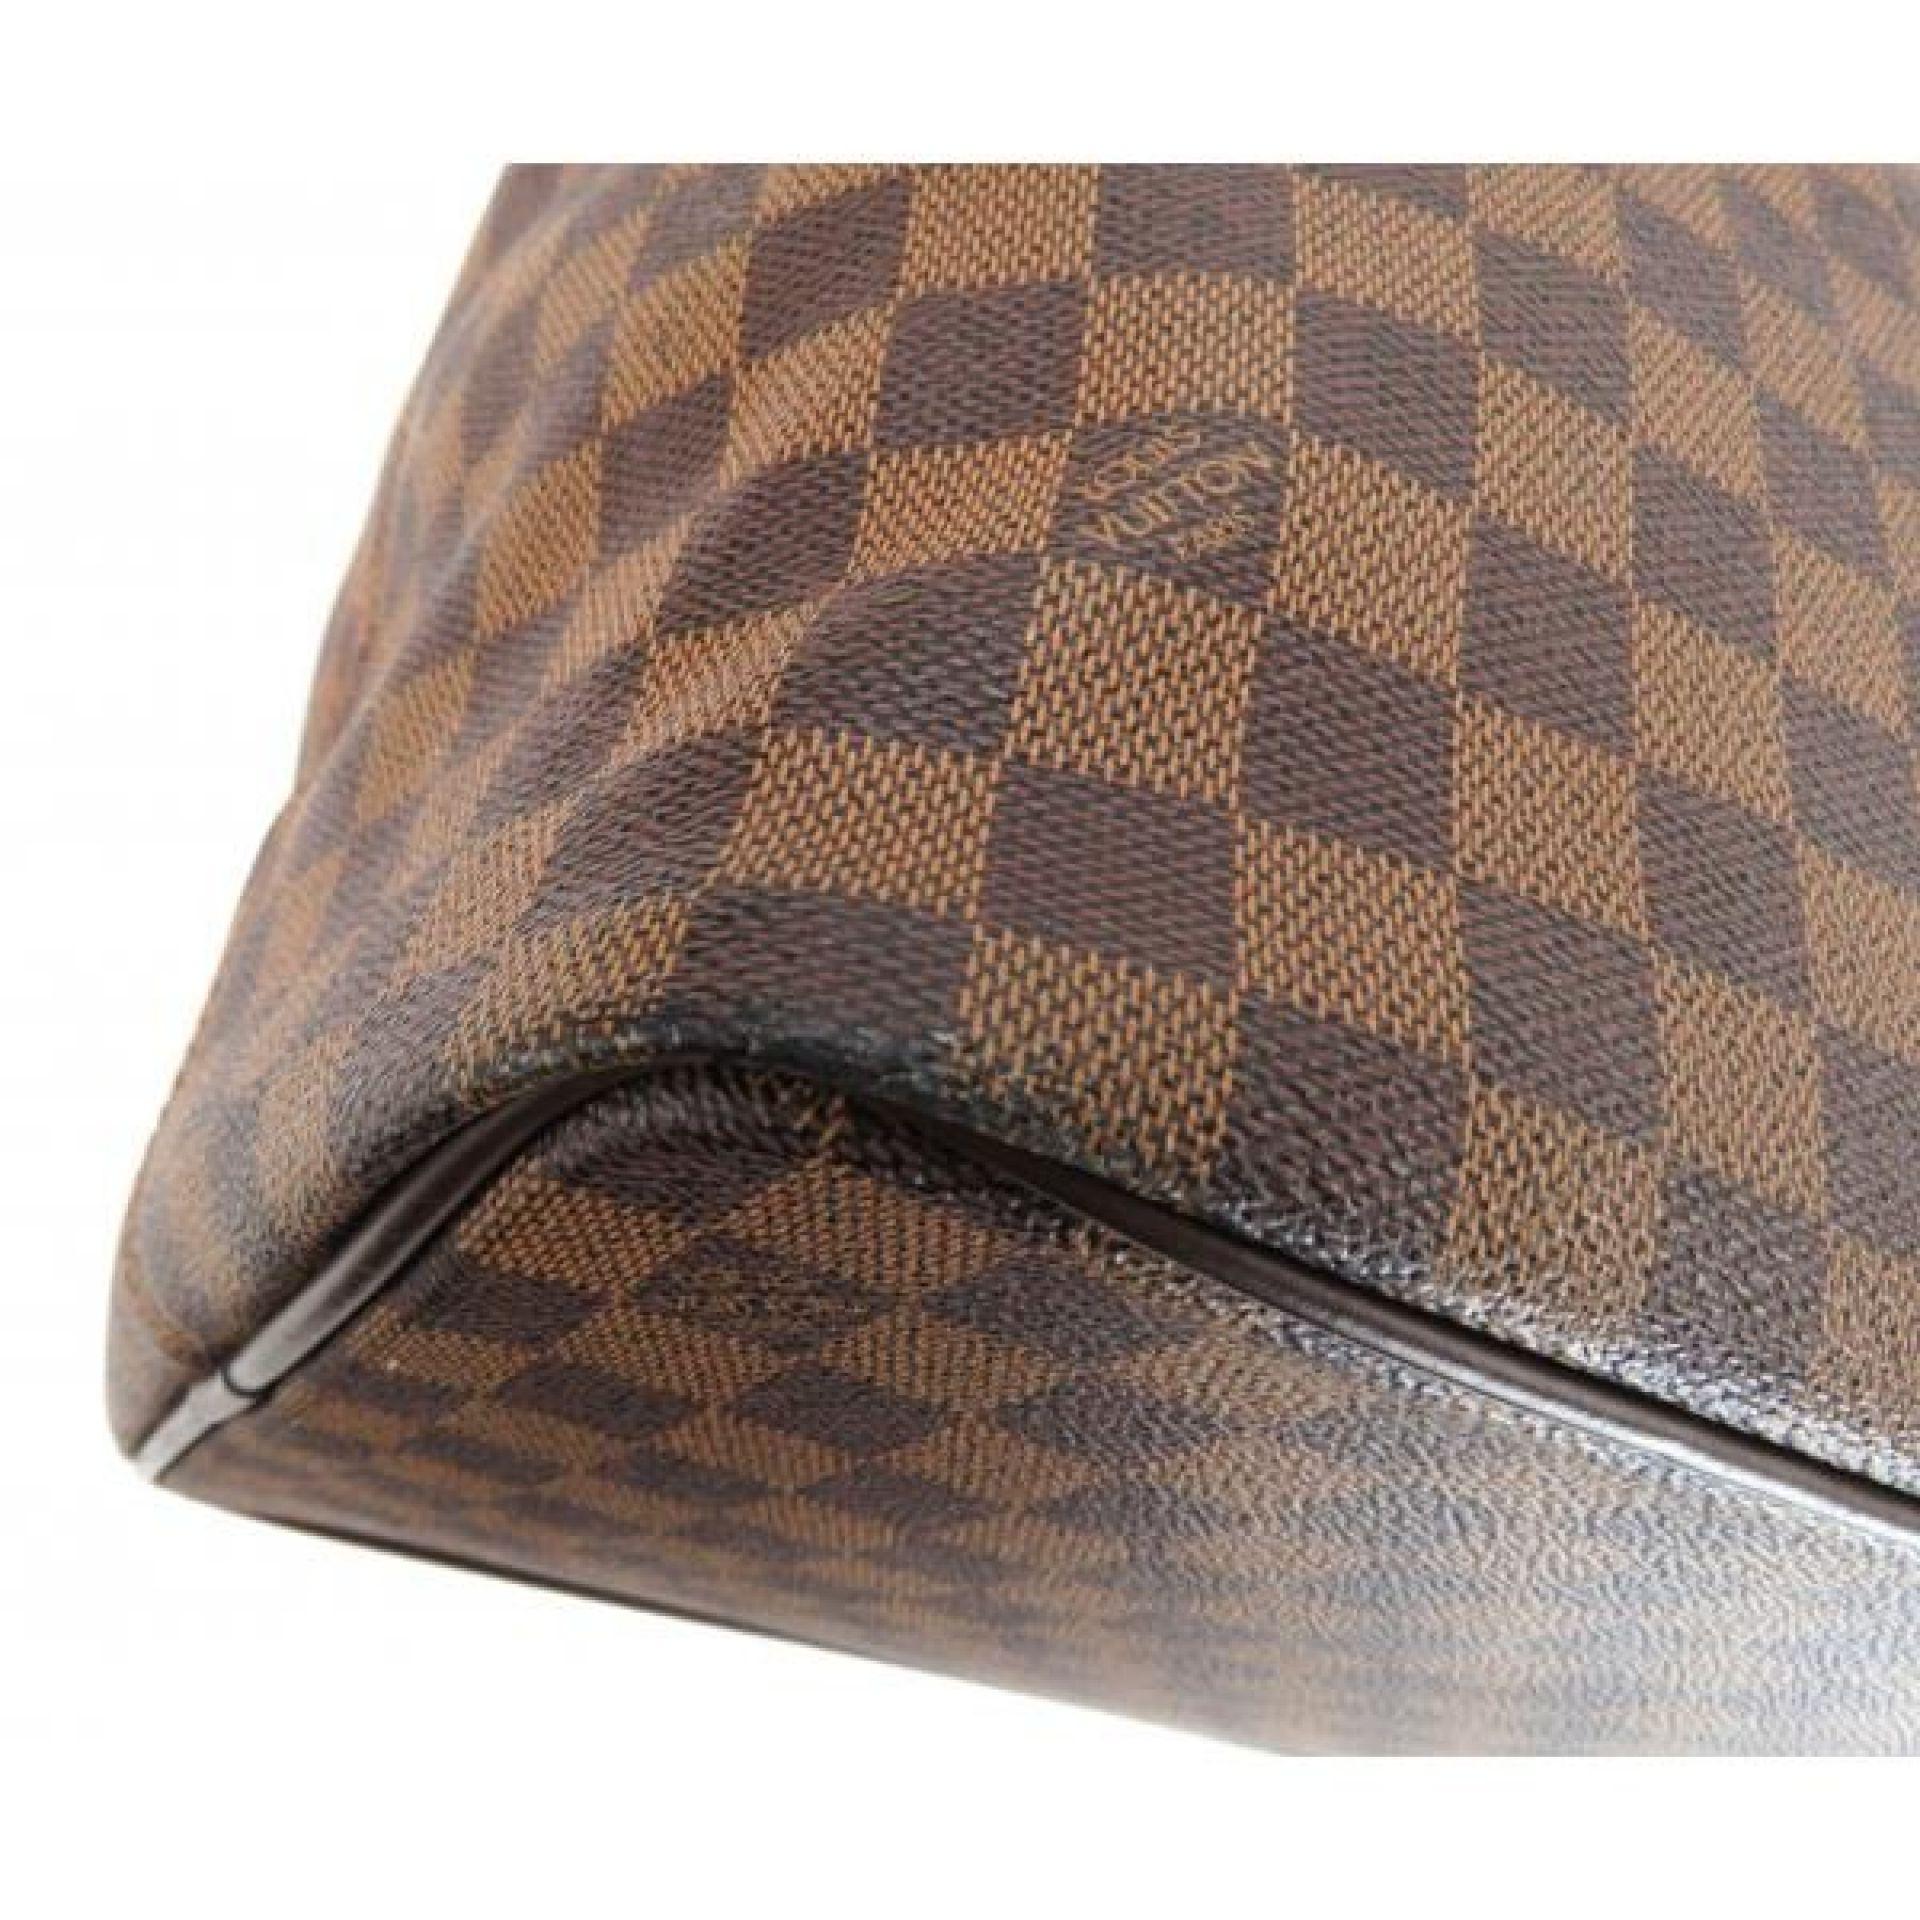 Louis Vuitton Ebene Damier Canvas Greenwich PM Duffle Bag